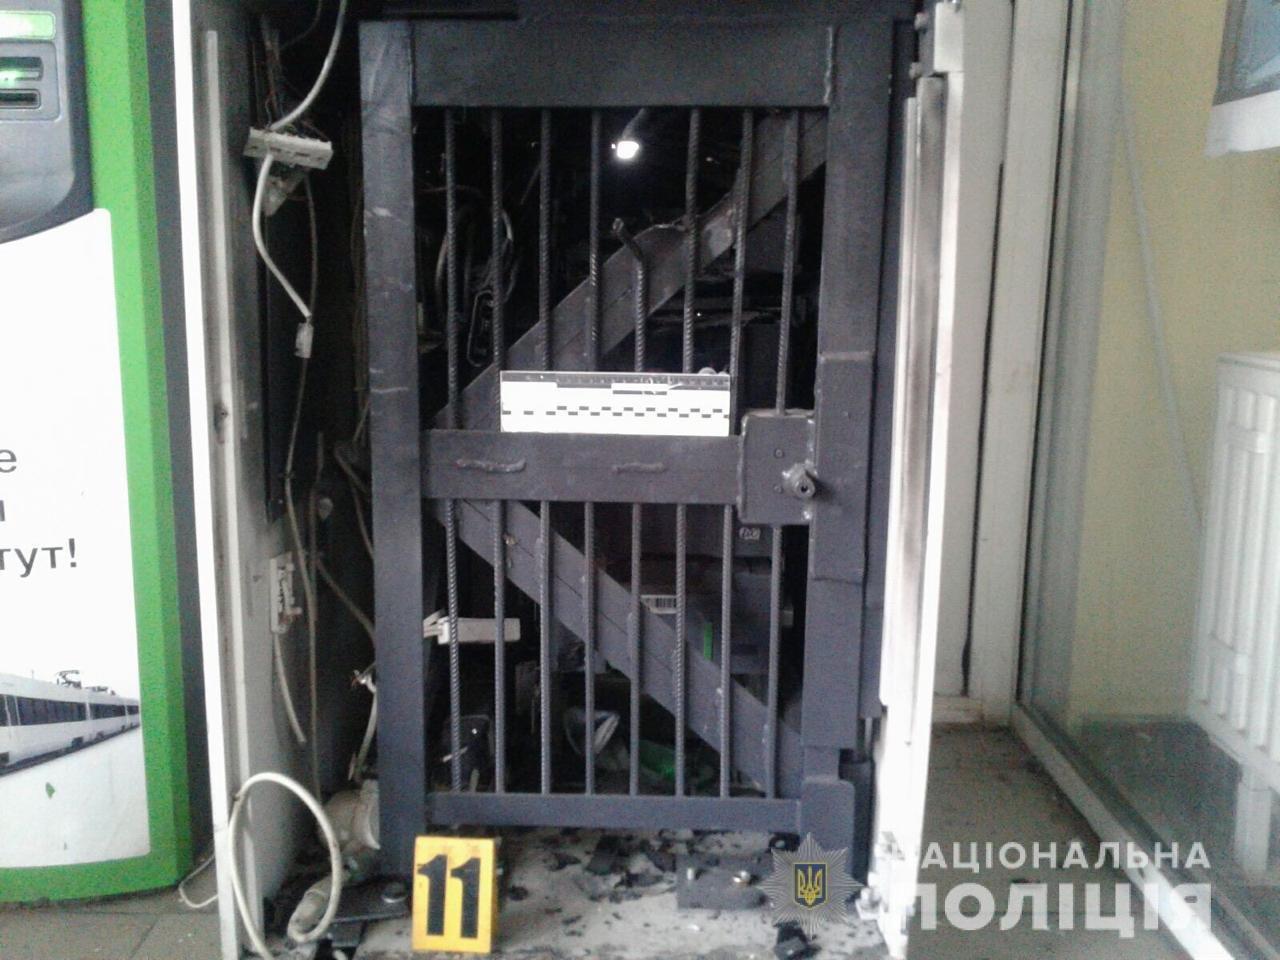 В Харькове неизвестные взорвали банкомат, находящийся в супермаркете, - ФОТО, фото-3